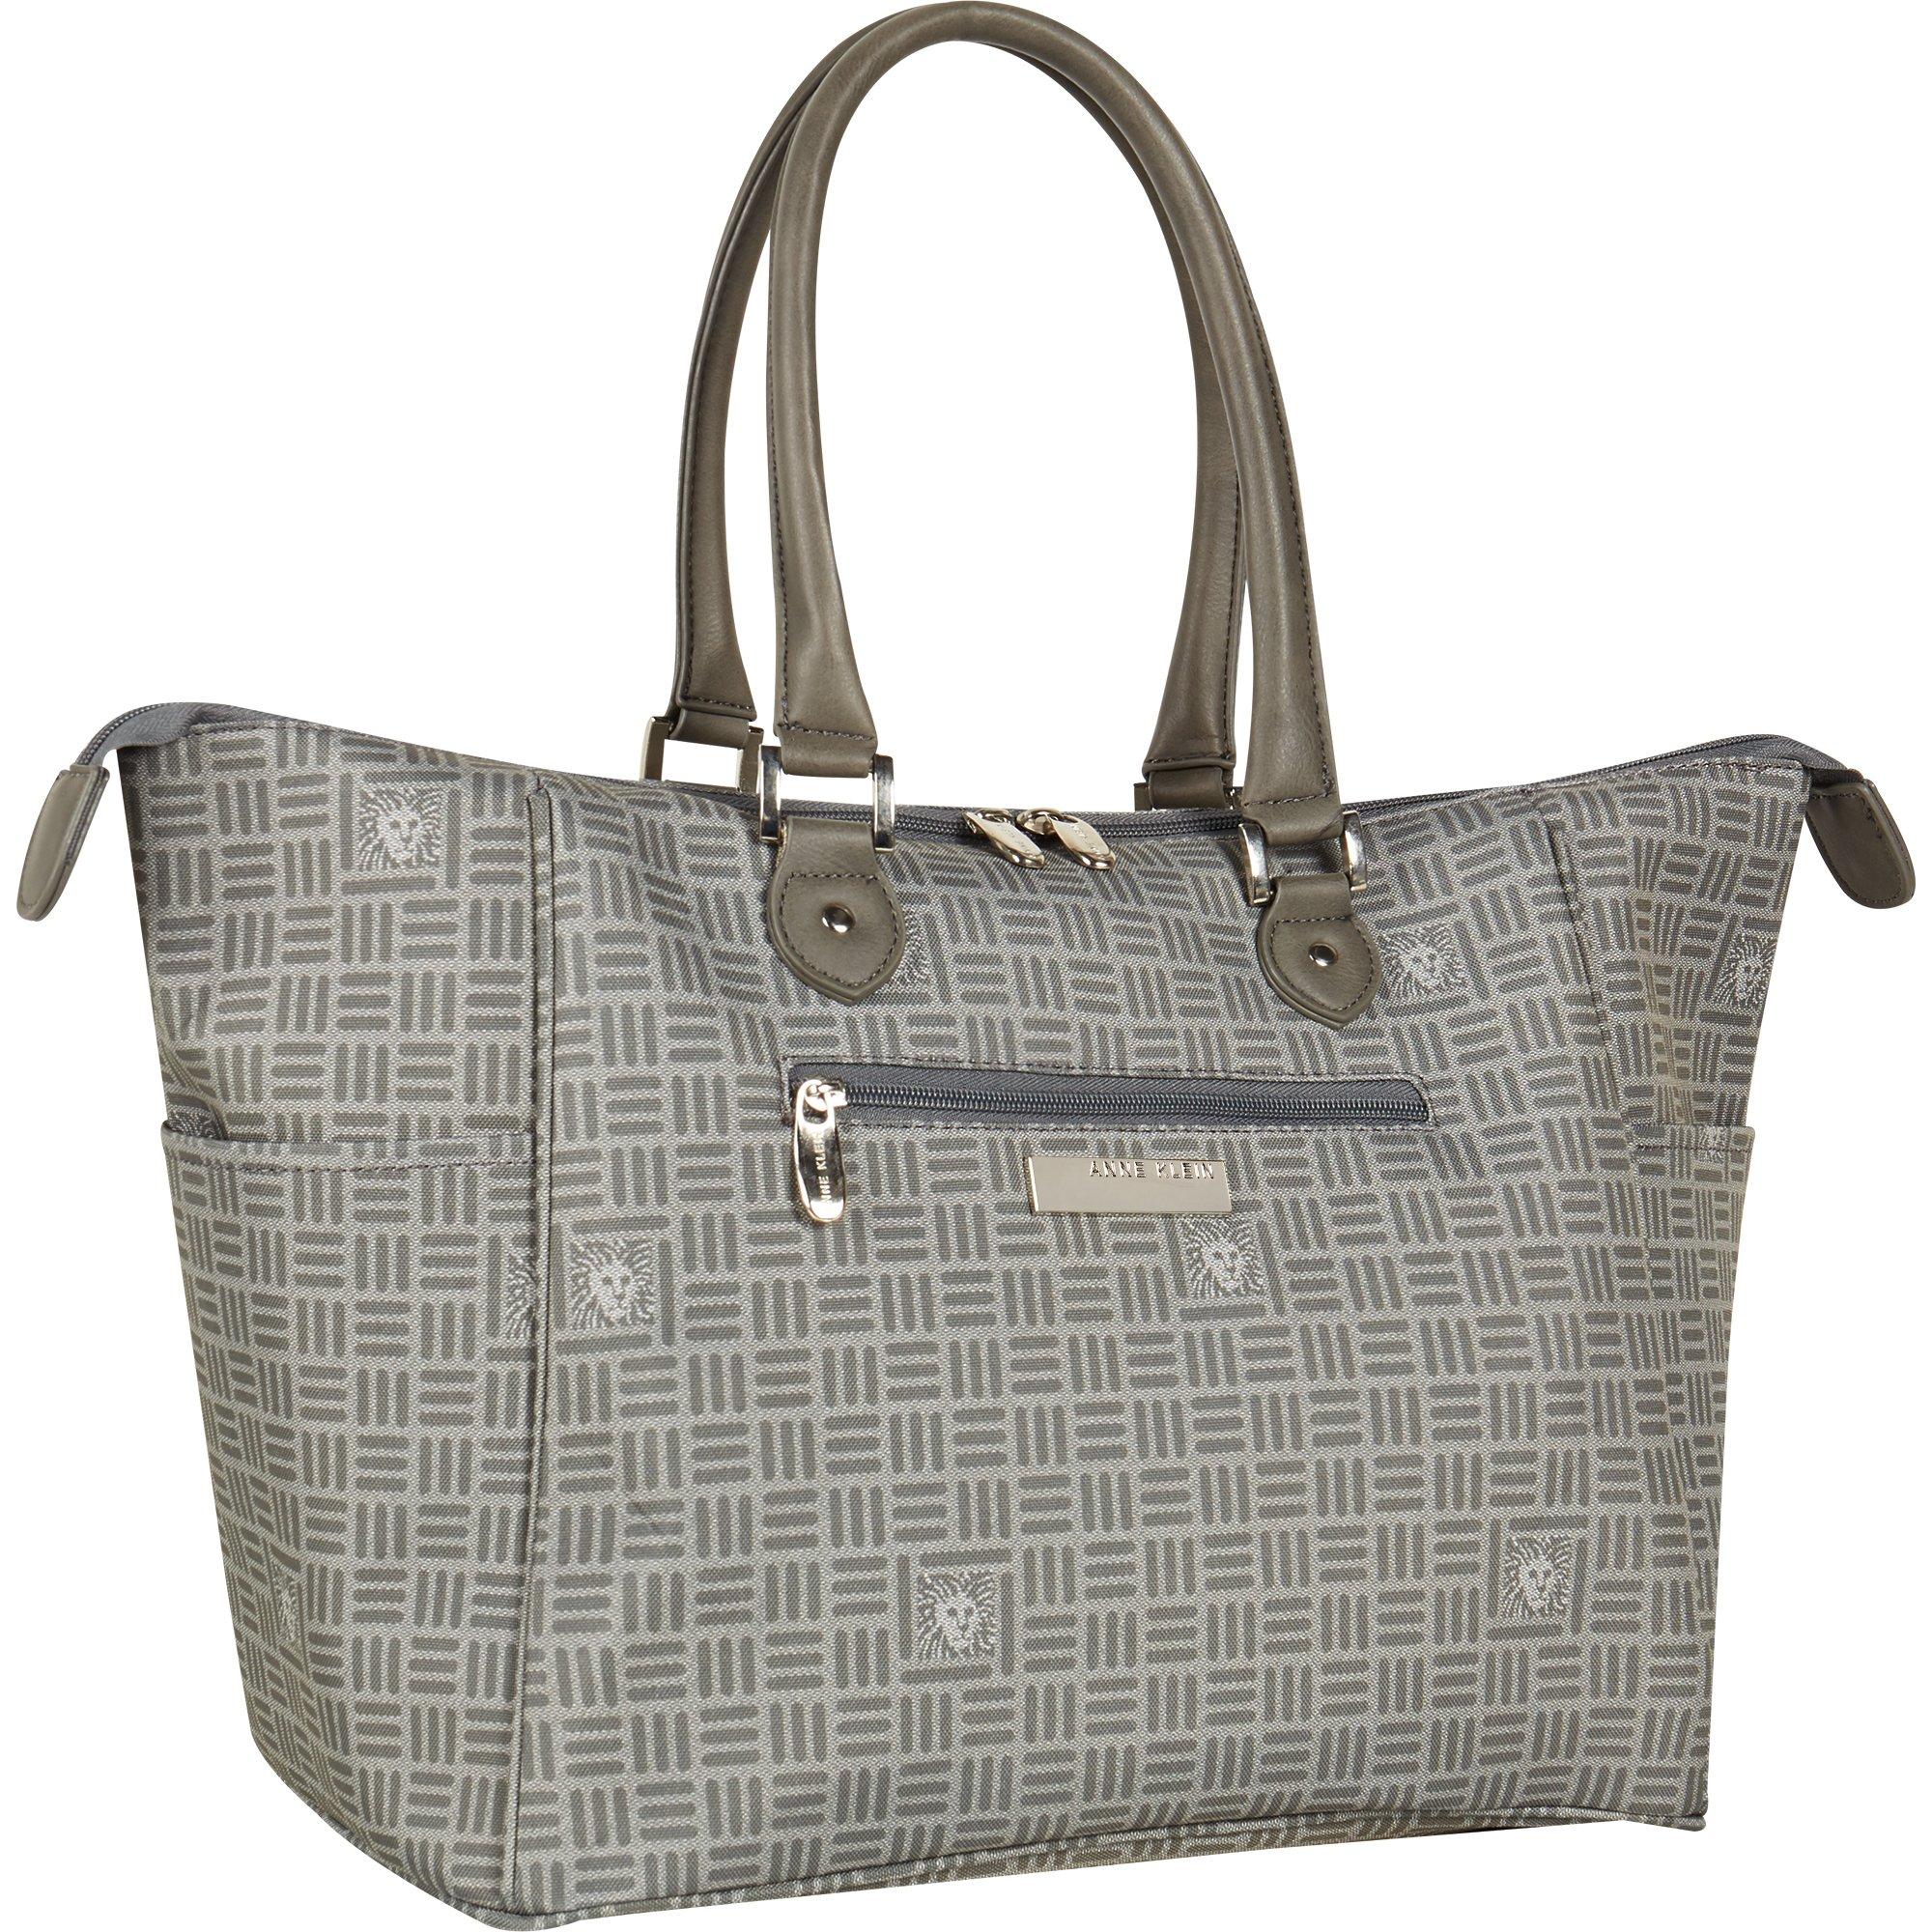 Anne Klein Perfect Travel Tote Bag, Grey Lion